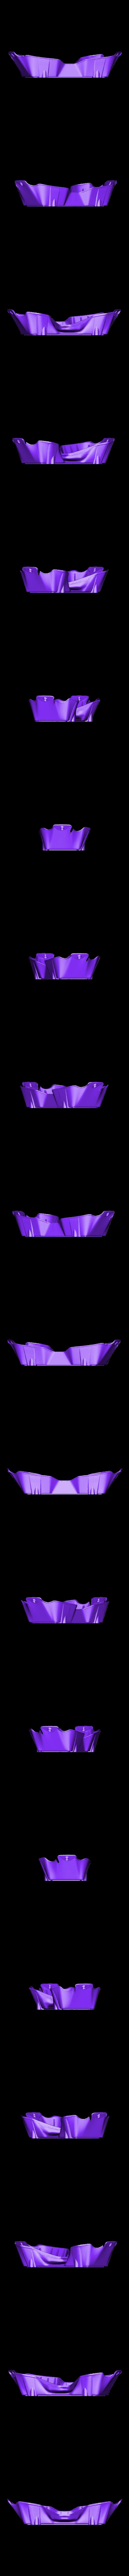 XAir_FrontPlate.stl Download free STL file DJI FPV Goggles X-Air Faceplate integration • Design to 3D print, JTR1